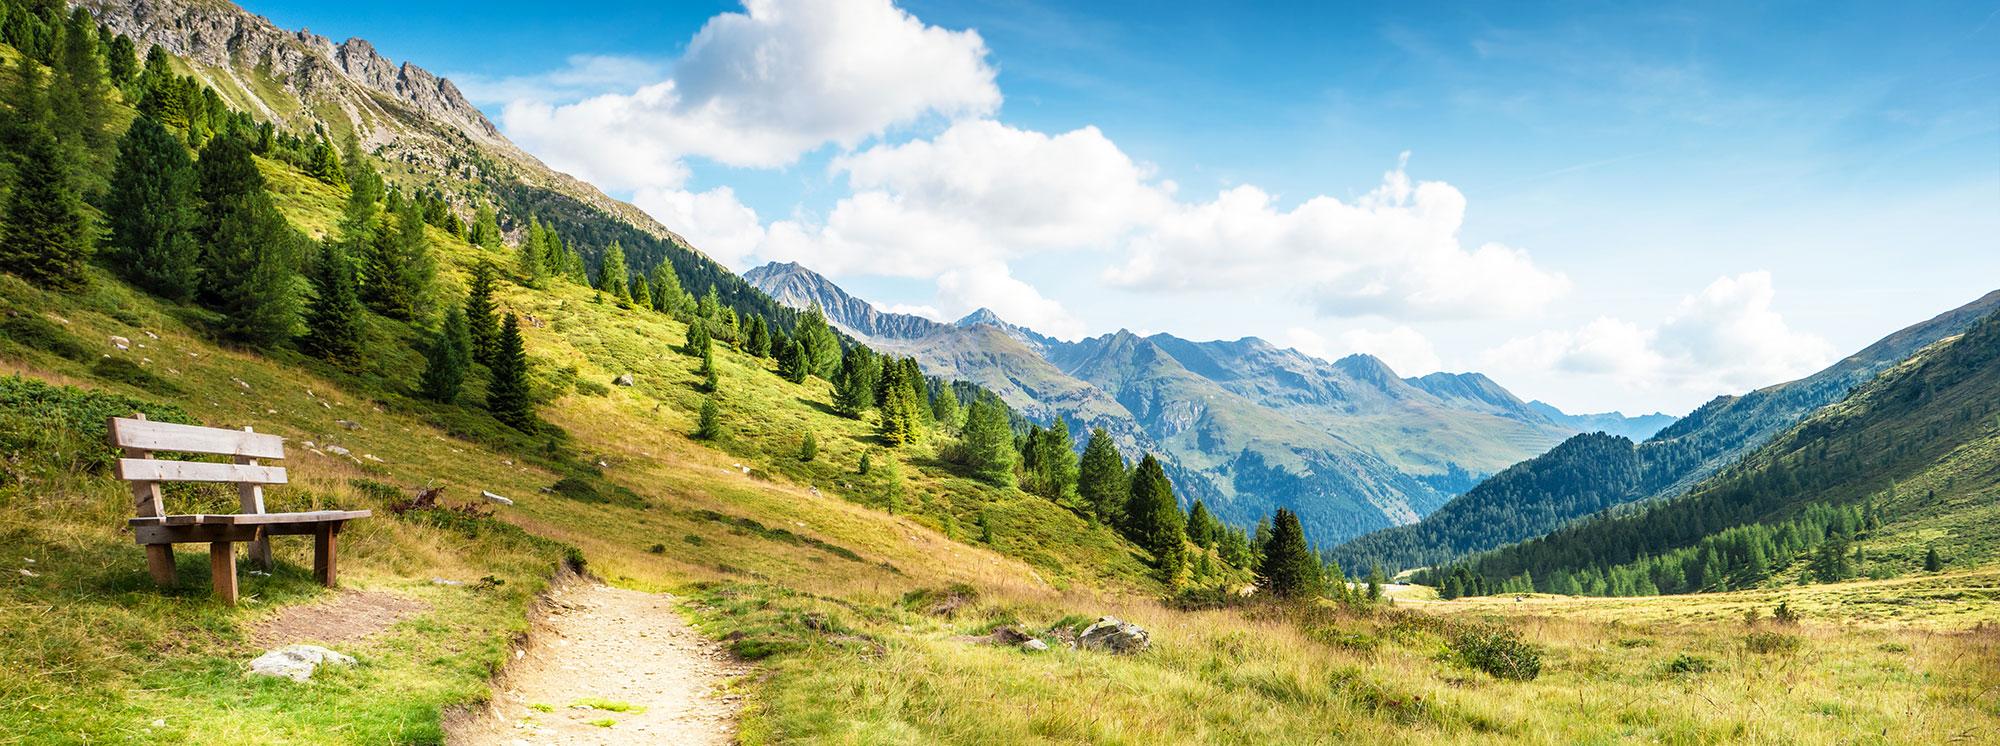 The beauty of the landscape of l'Alpe d'Huez l'summer